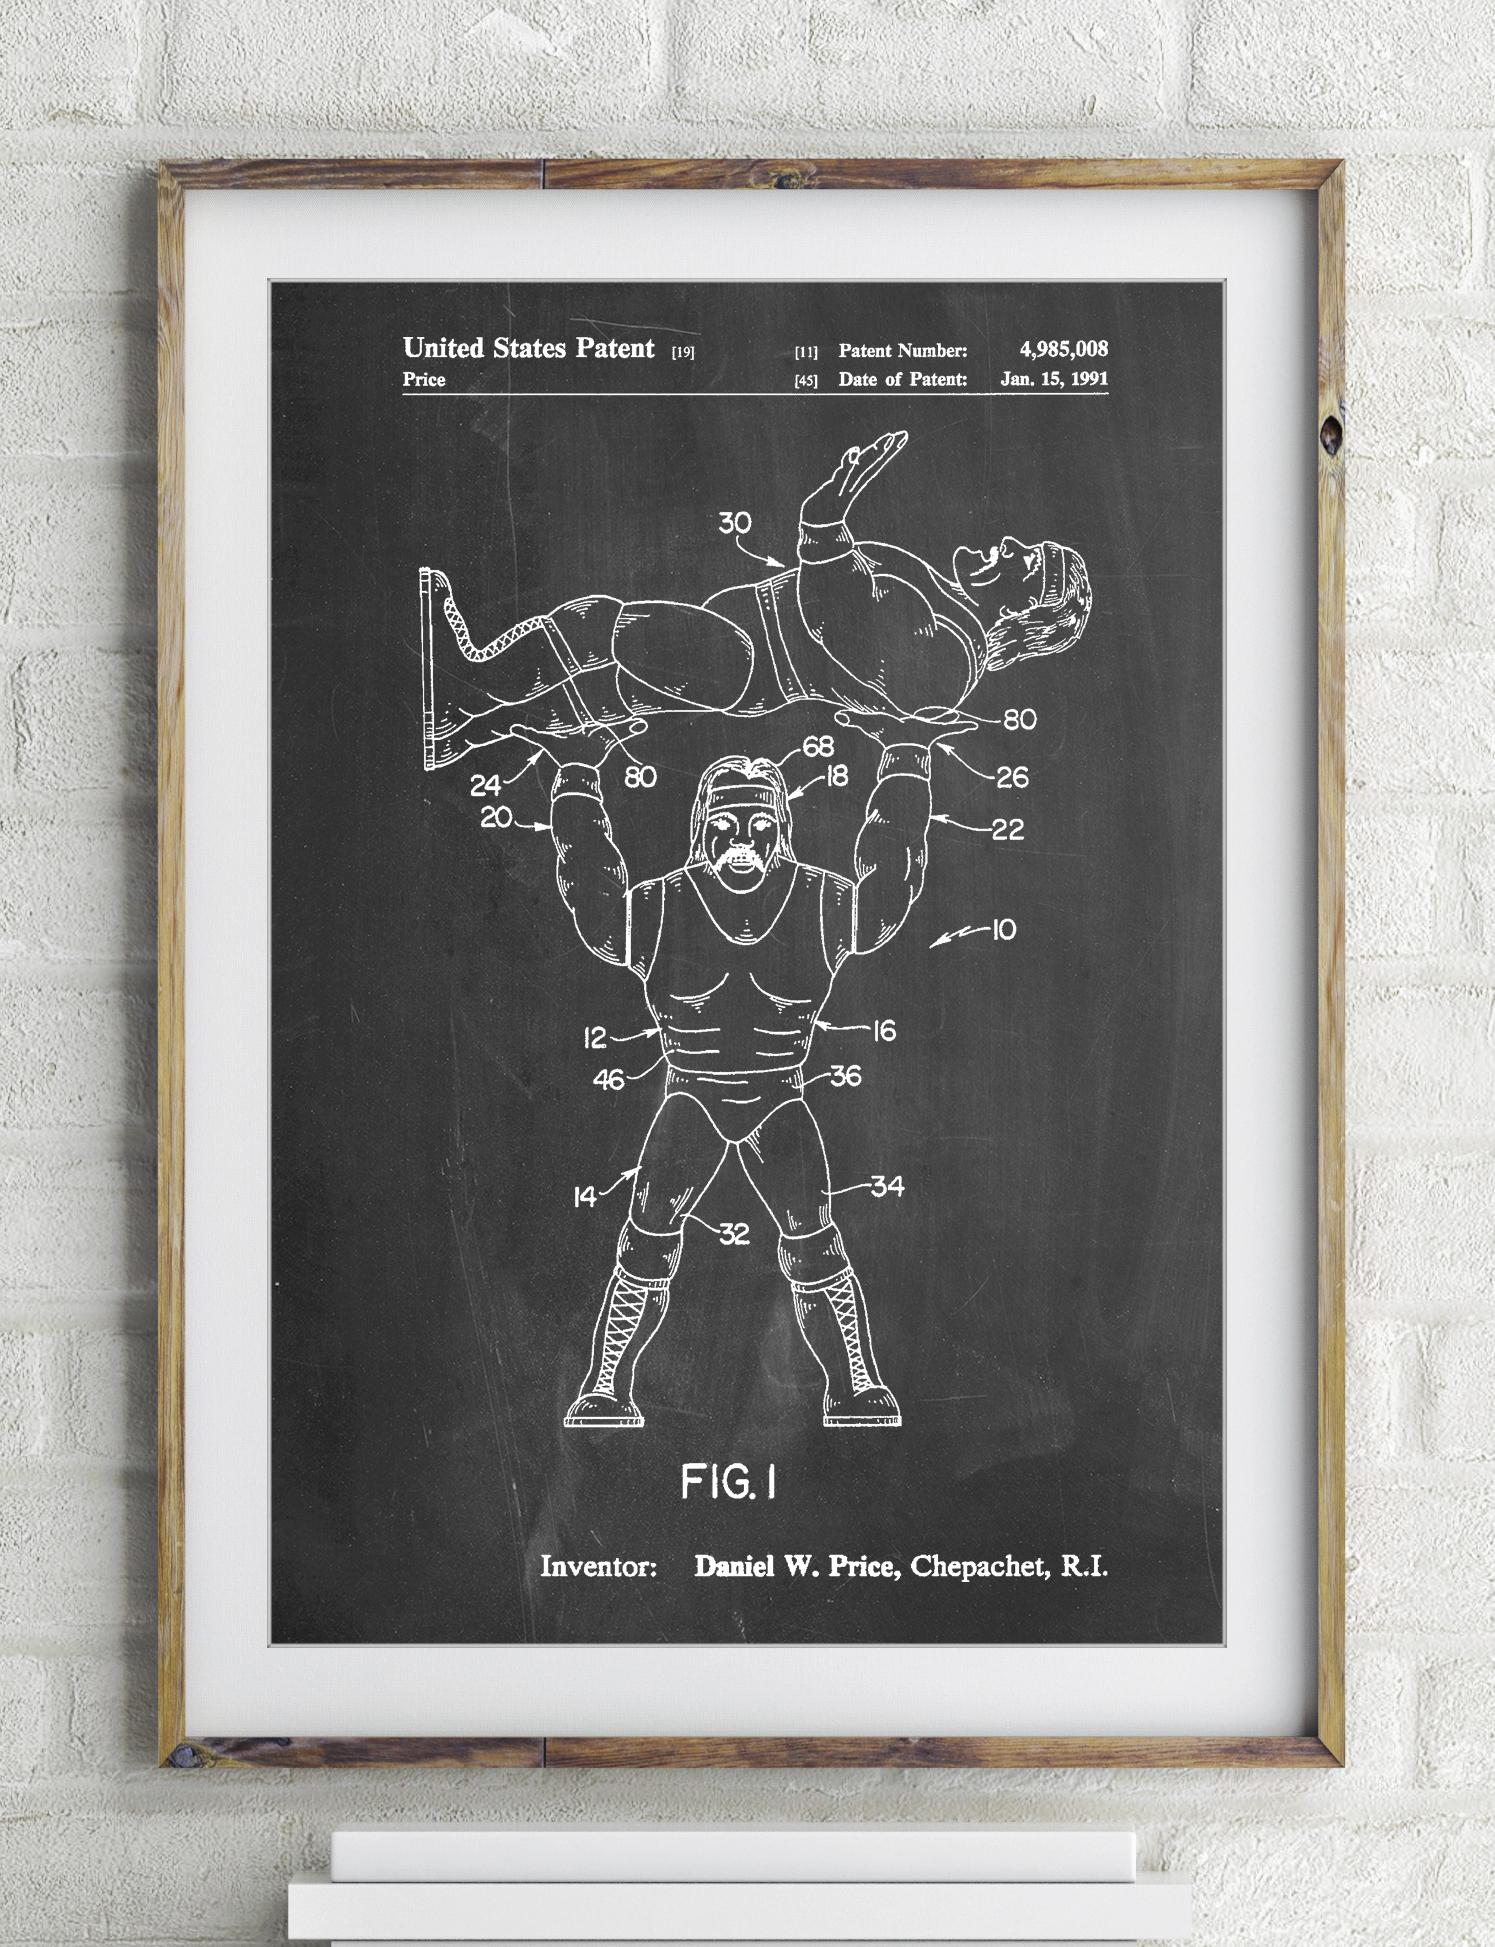 Hulk Hogan Wrestling Action Figure Patent Poster 2364537